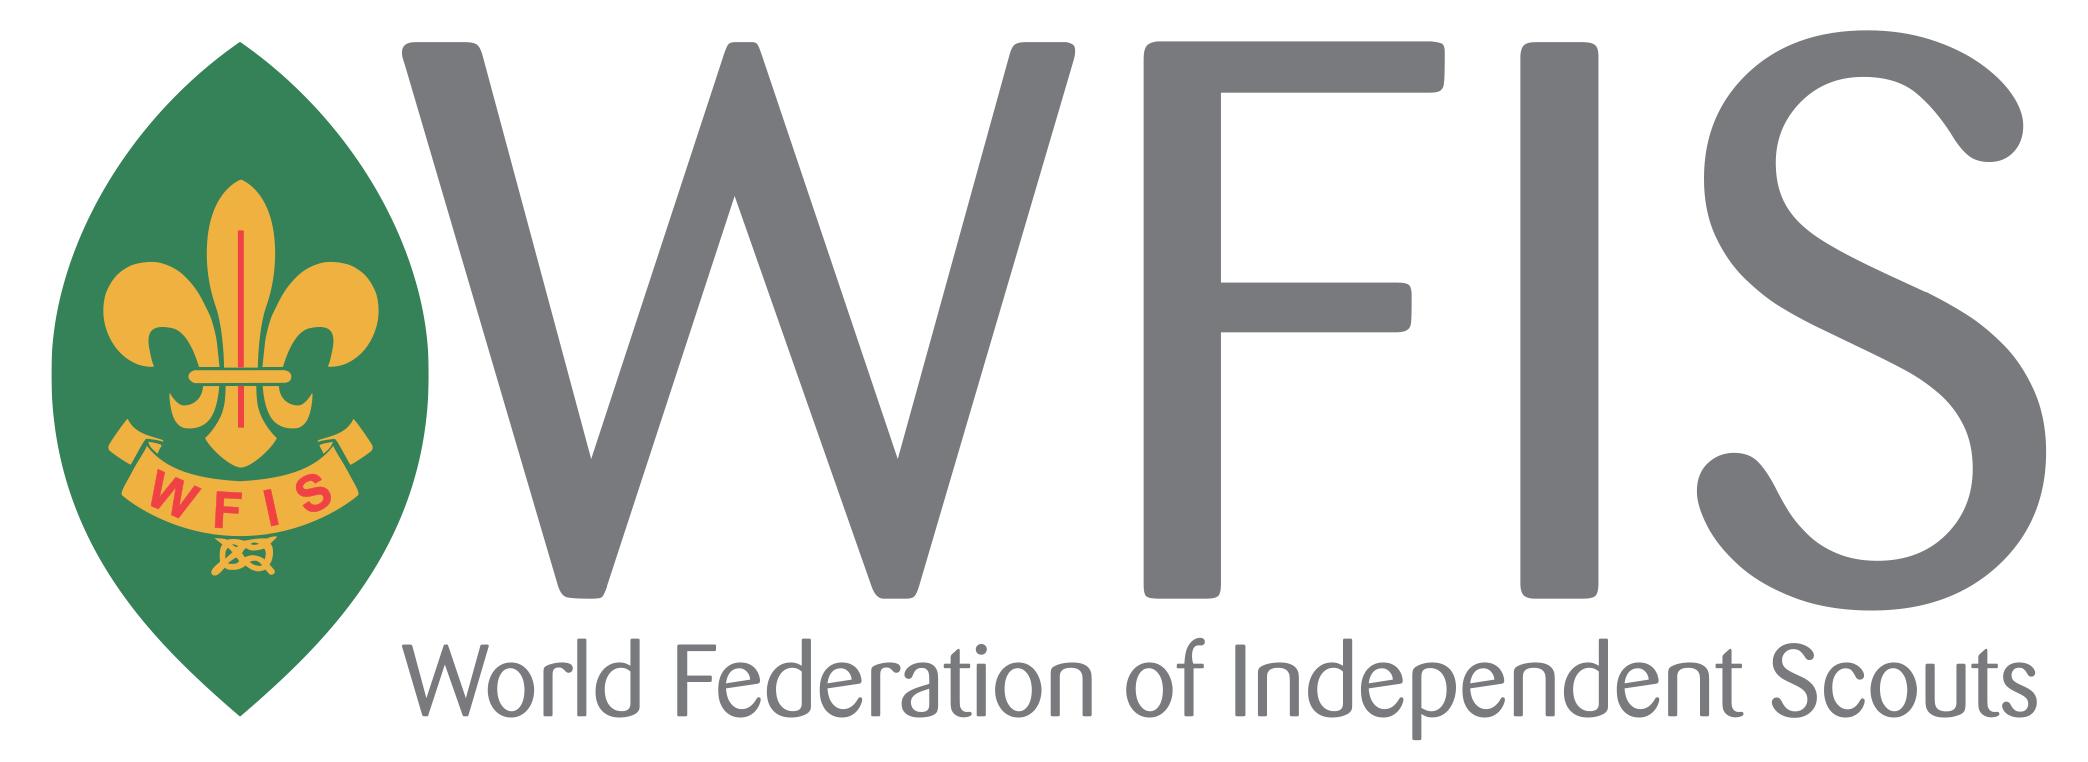 WFIS Europe